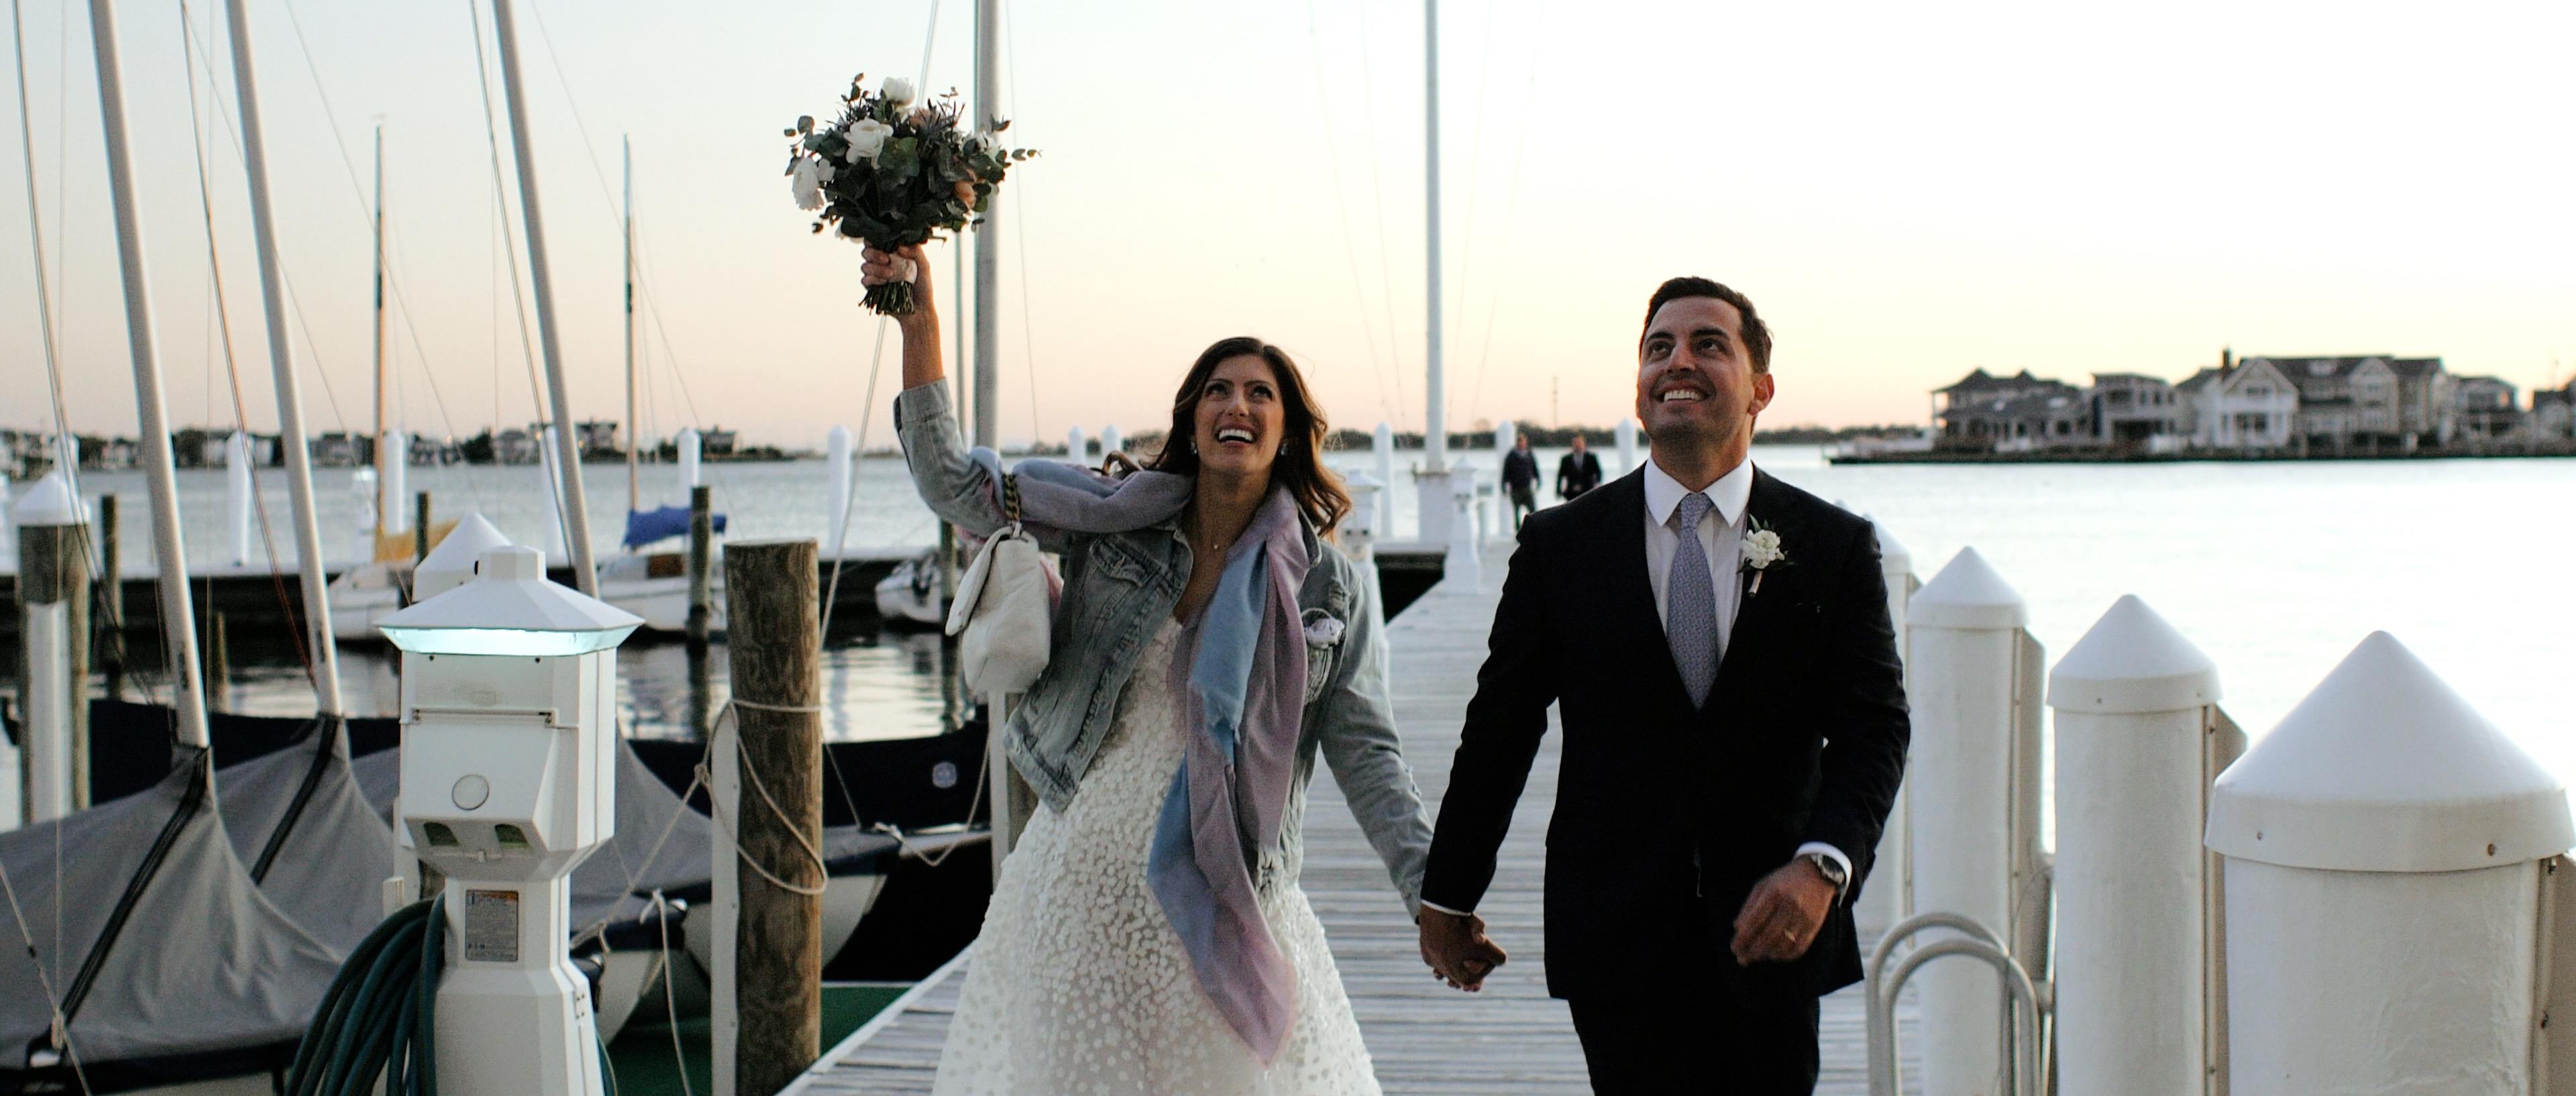 Jessica + Anthony | Bay Head, New Jersey | Bay Head Yacht Club